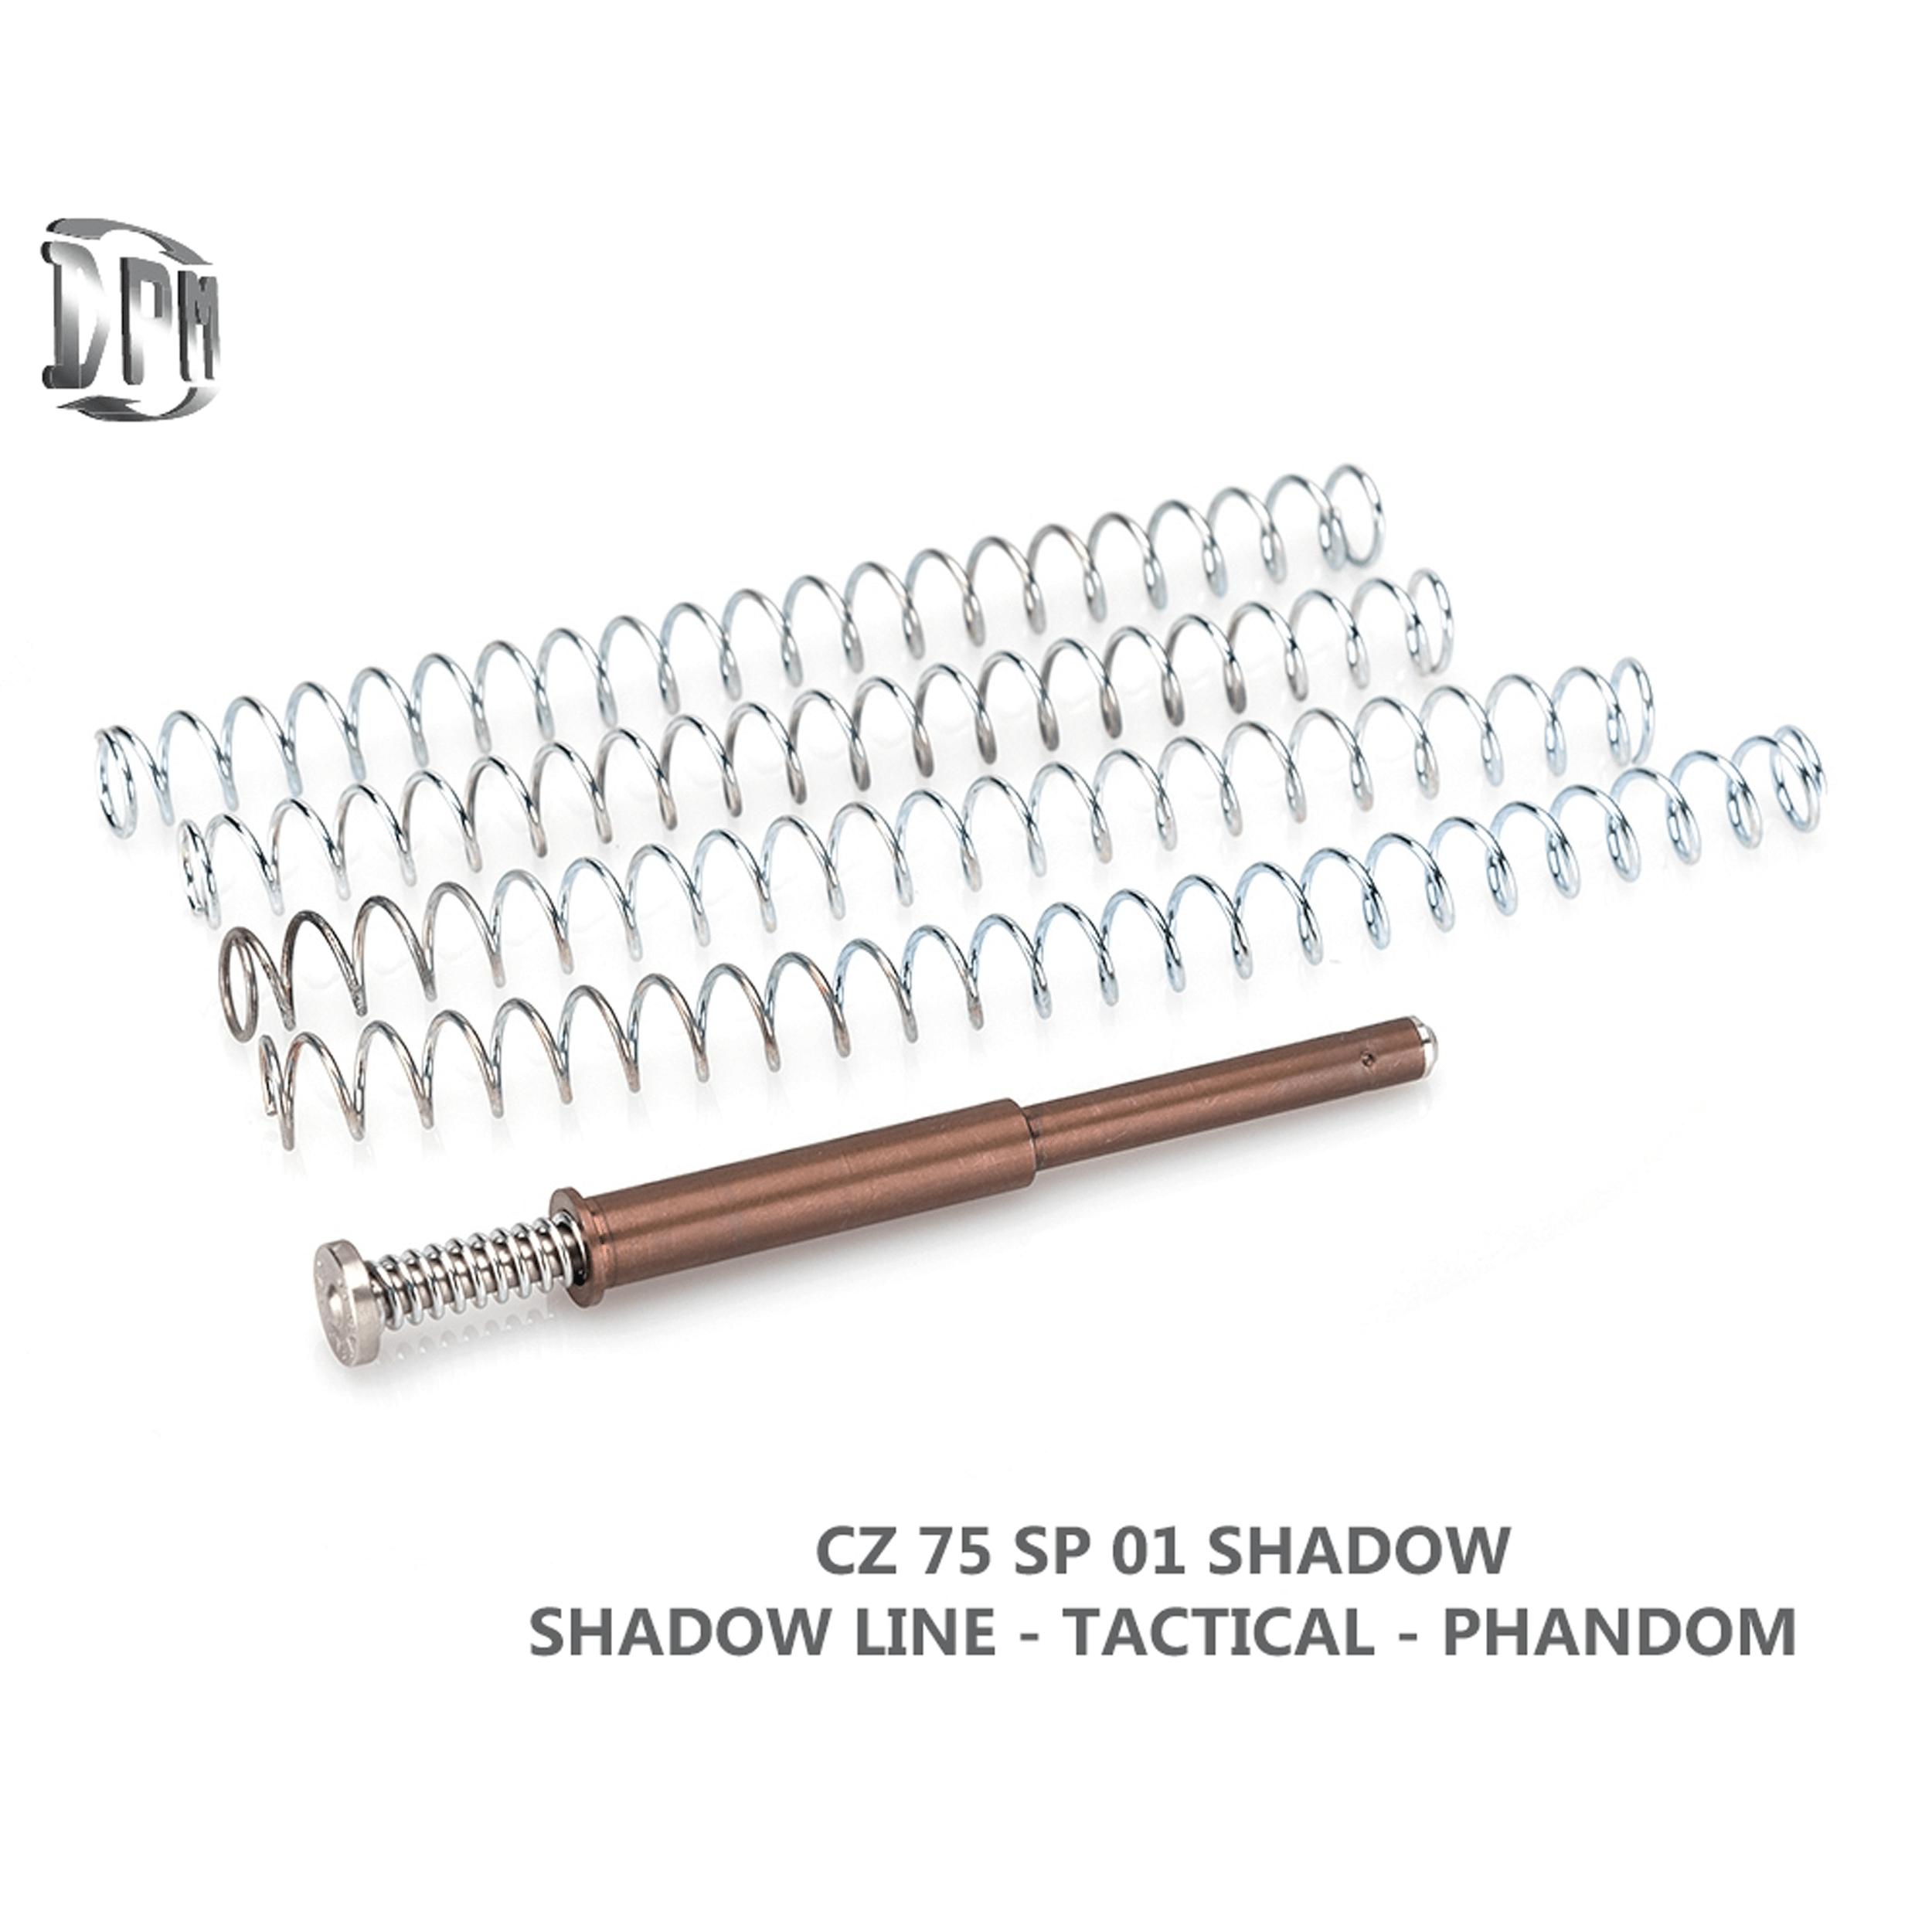 CZ 75 SP 01 - Shadow - Mamba - Tactical - Phantom - TS Orange - 9mm